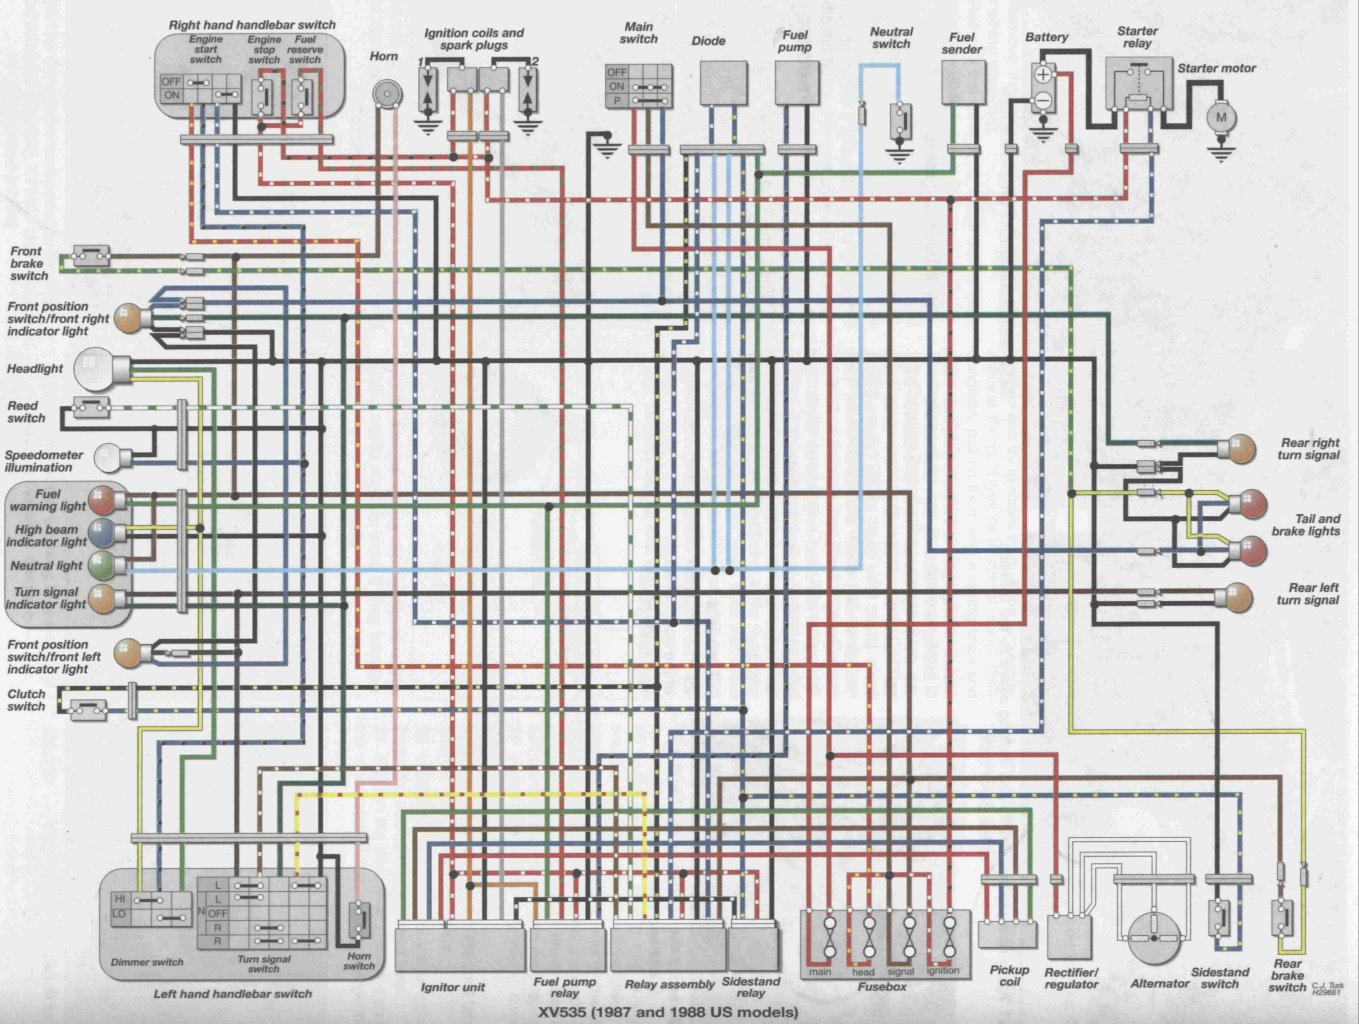 1984 honda vt500c wiring diagram color wiring diagrams data base rh alfrescosolutions co 1984 honda shadow [ 1359 x 1024 Pixel ]